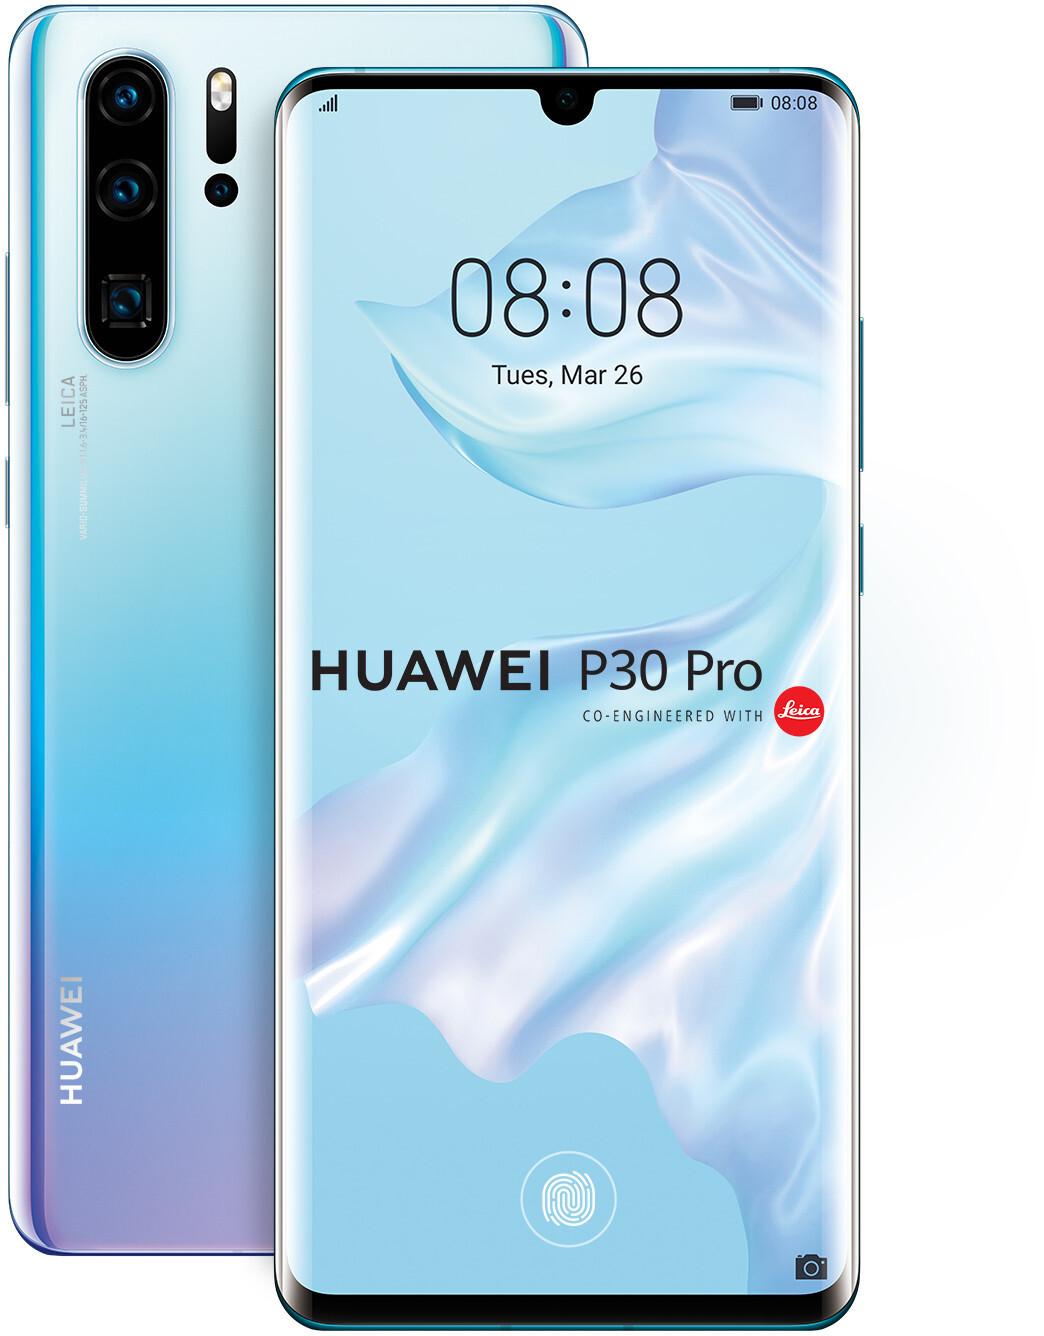 Image of Huawei P30 Pro 6GB 128GB Breathing Crystal